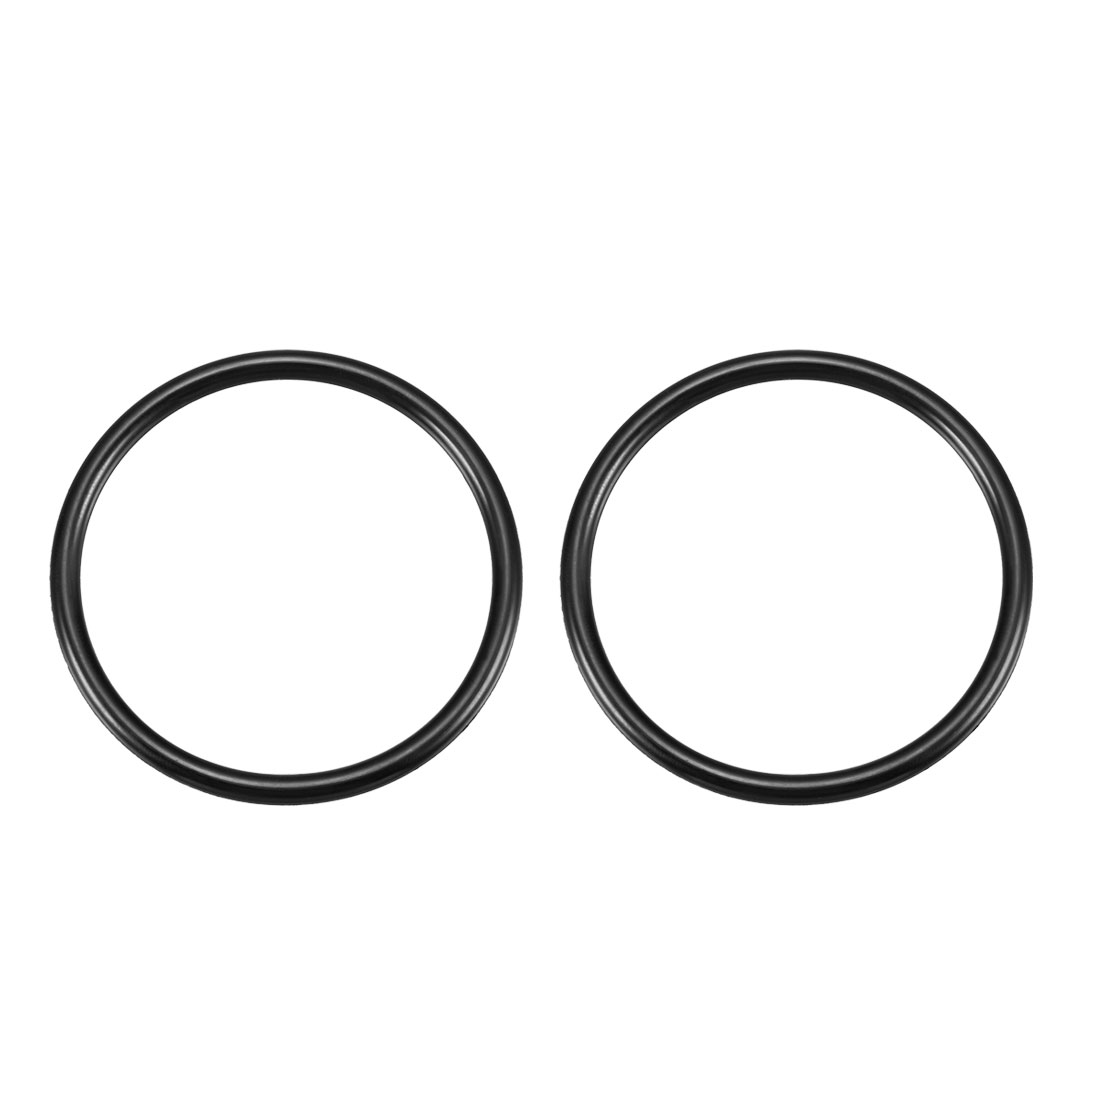 "Black 2.2"" External Diameter Rubber Oil Seal O Ring Gasket 2 Pcs"